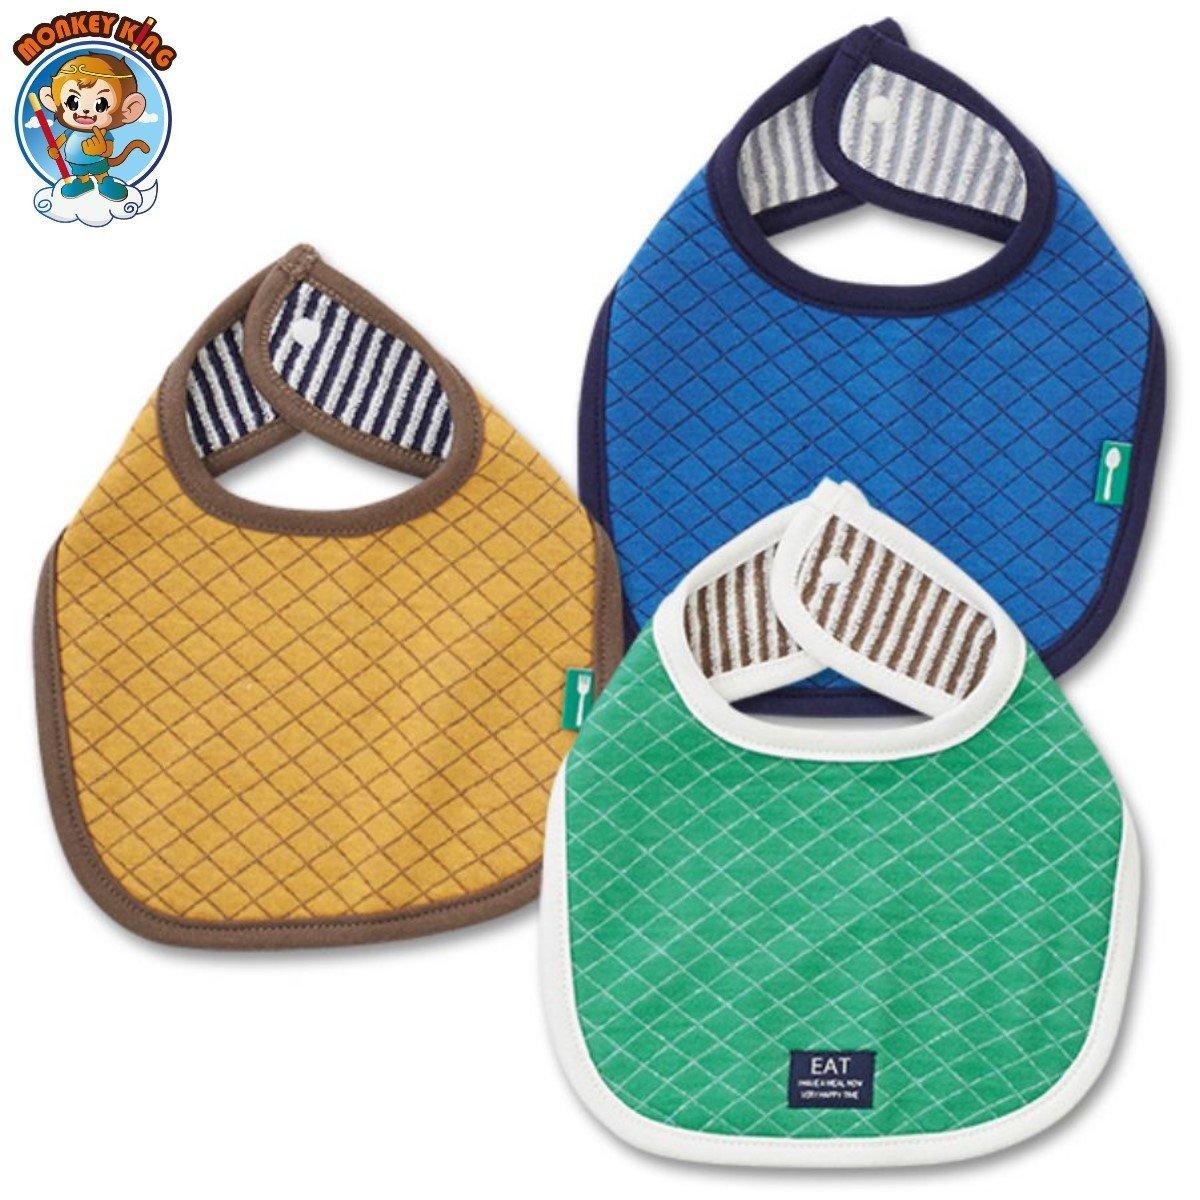 California Cotton Reversible Baby Bib/Muslin (3-Pack) - Blue/Green/Brown